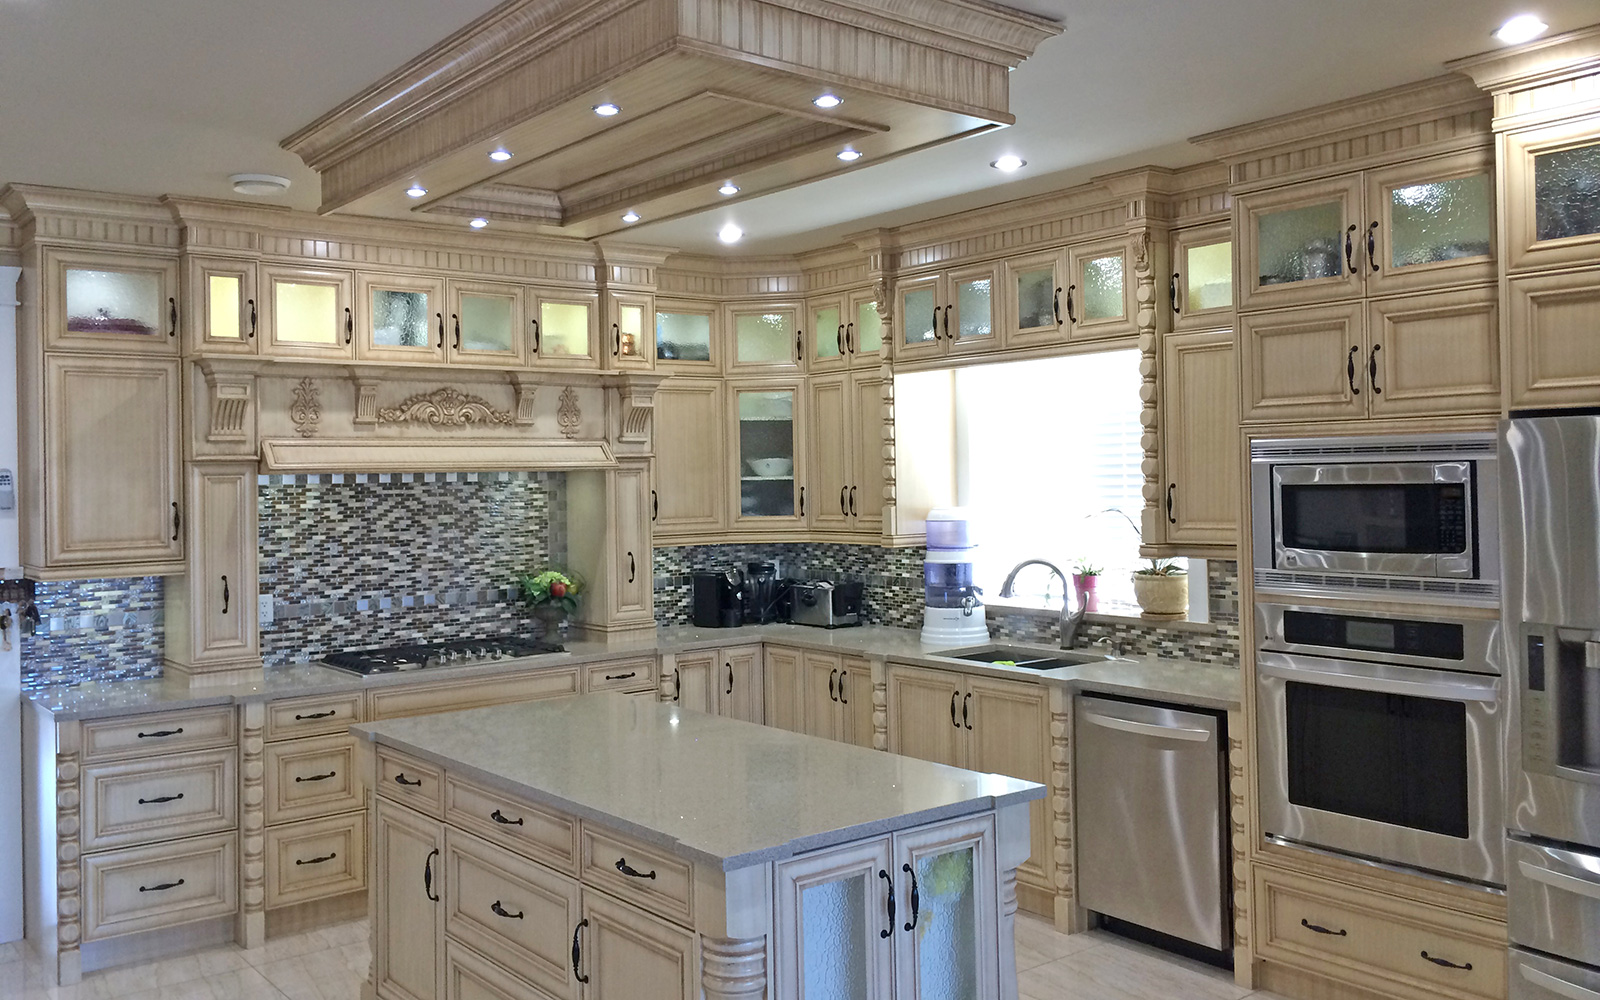 new kitchen cabinets wooden island calgary custom ltd countertops